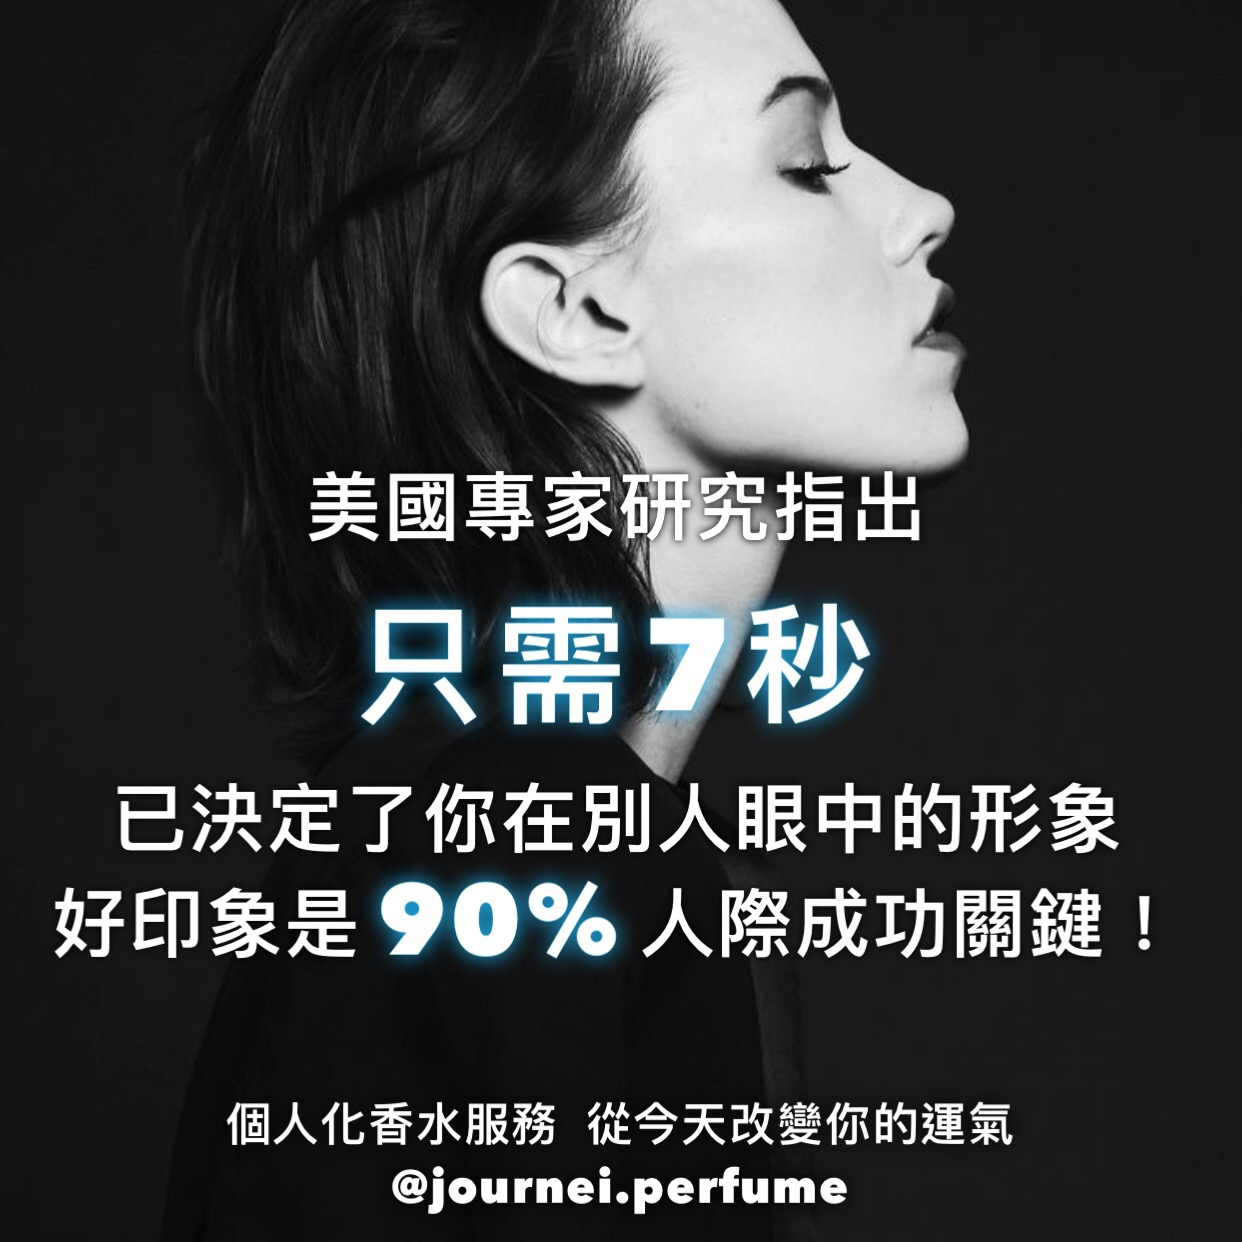 Tailor-made Perfume